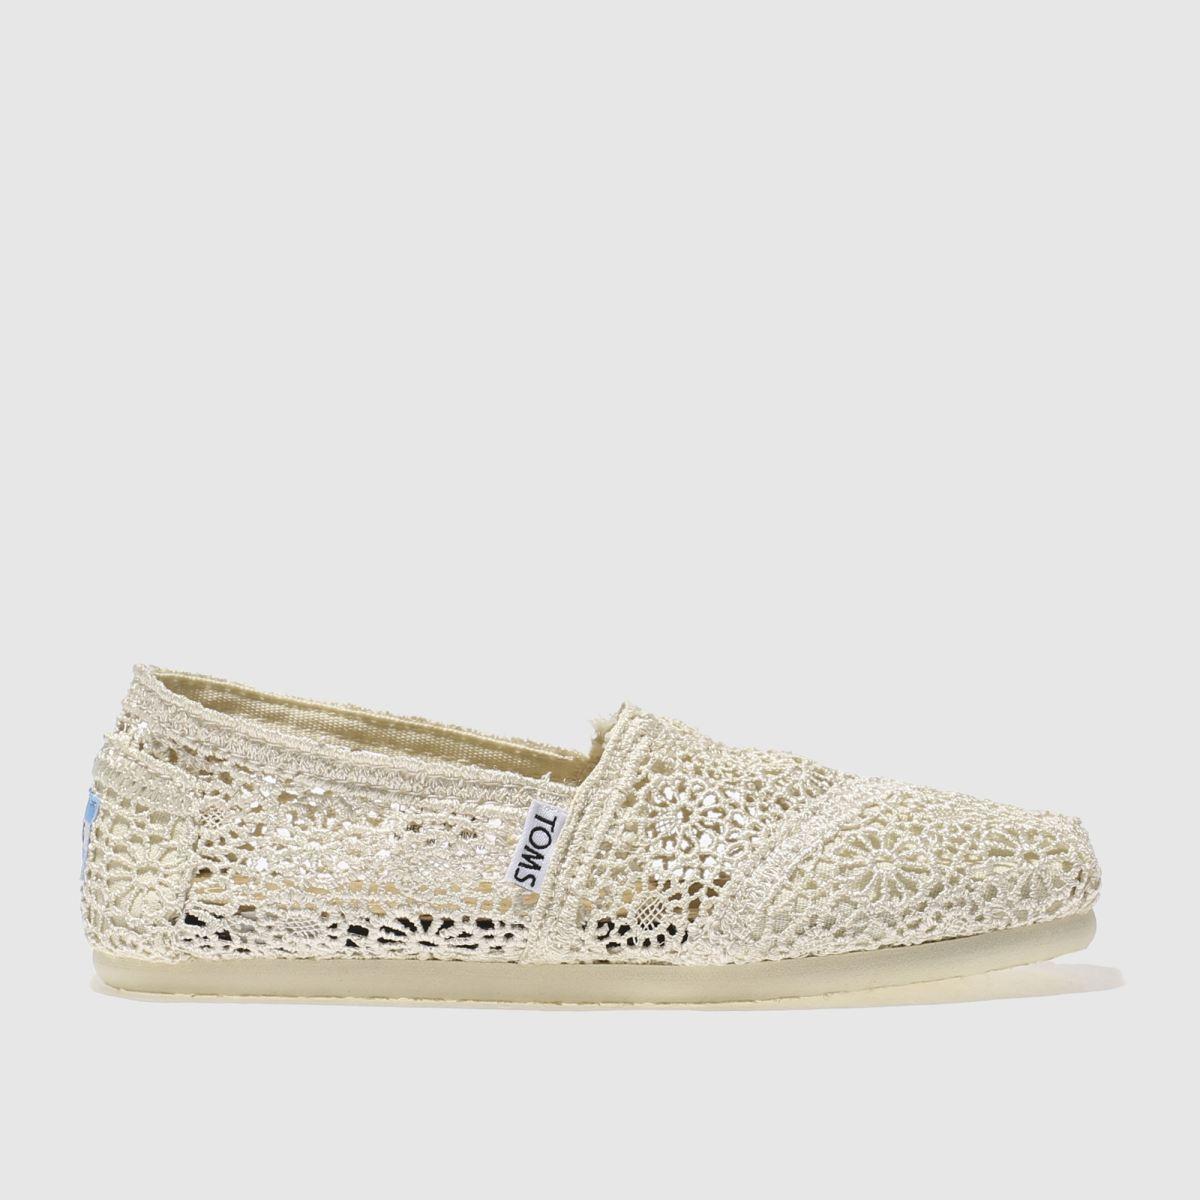 Toms Stone Classic Crochet Flat Shoes